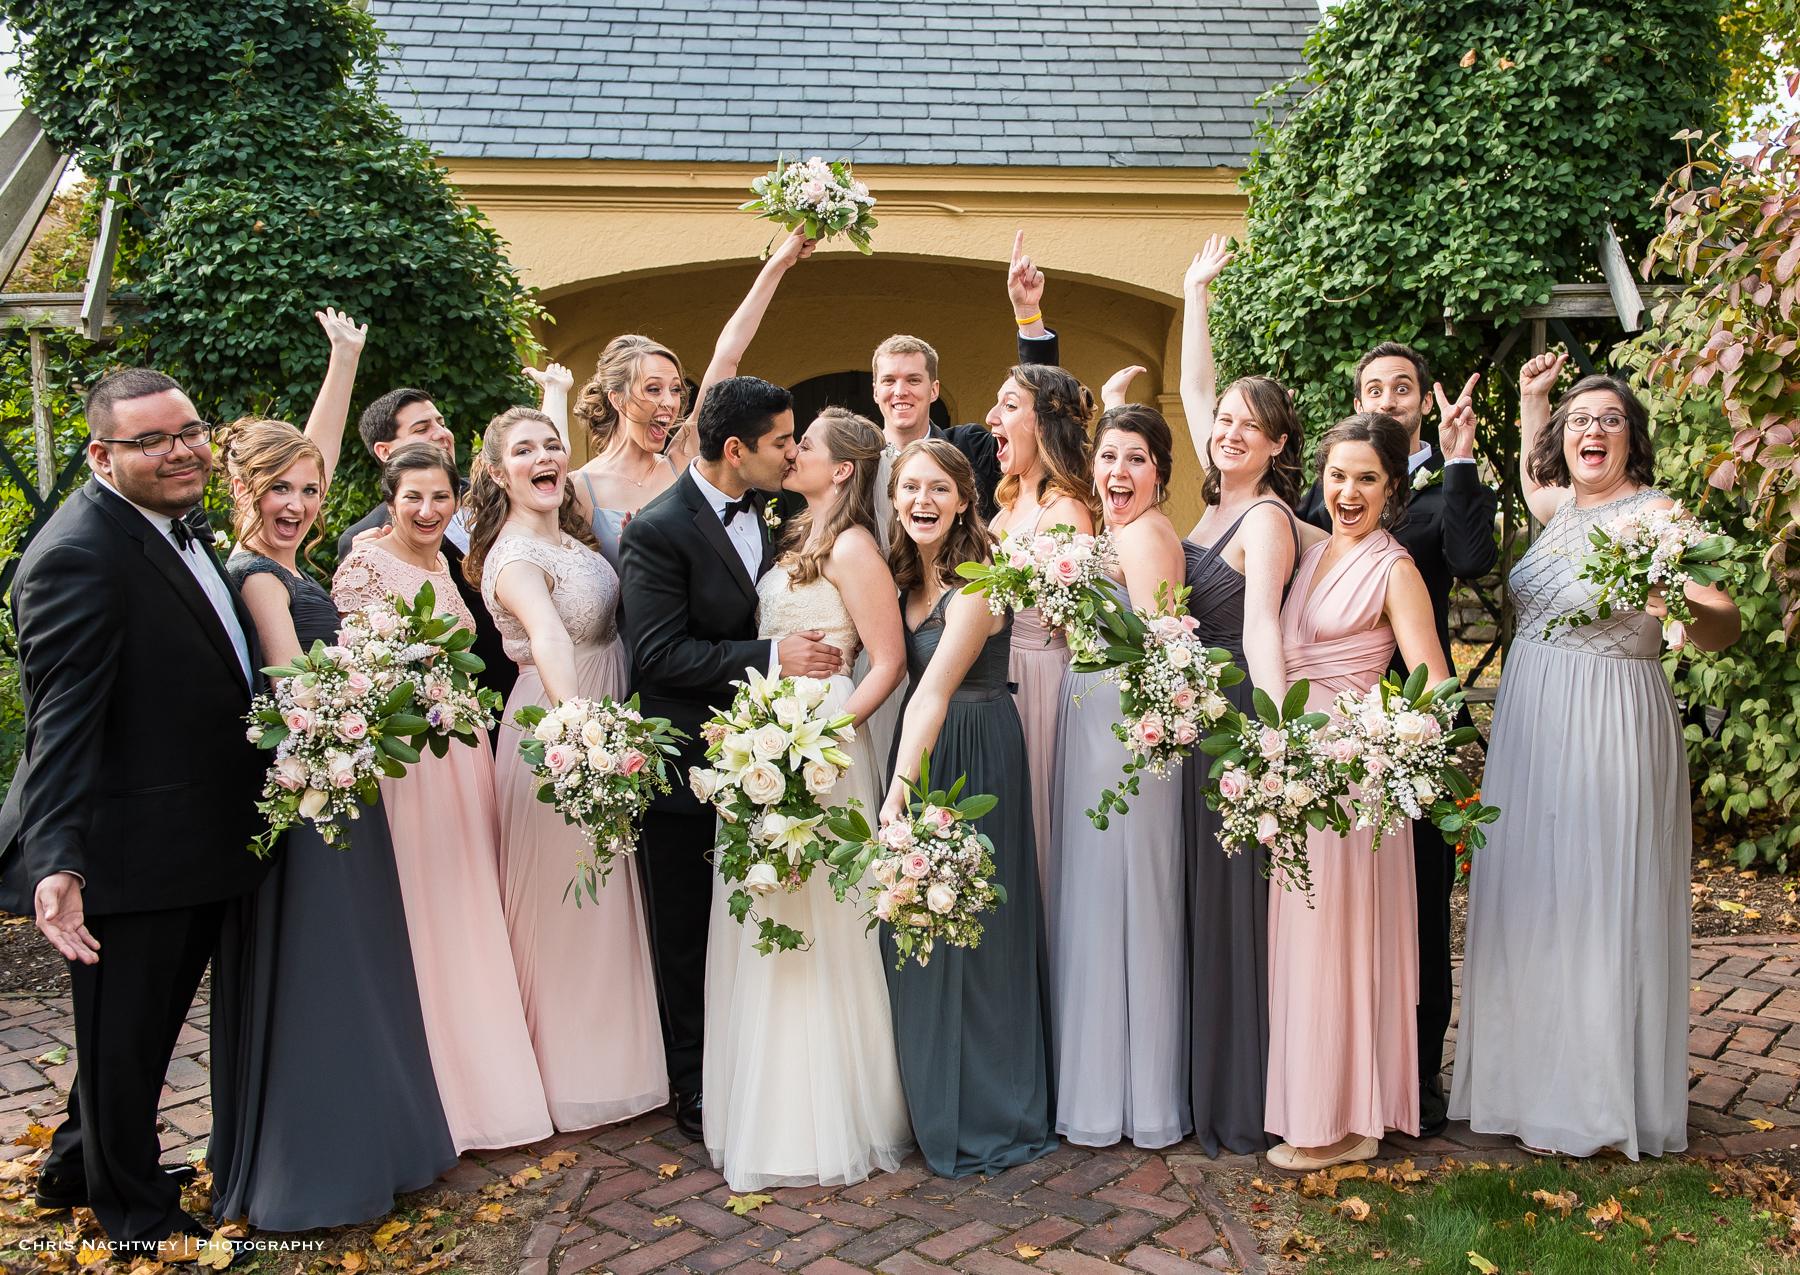 wedding-the-litchfield-inn-ct-photos-chris-nachtwey-photography-2018-28.jpg